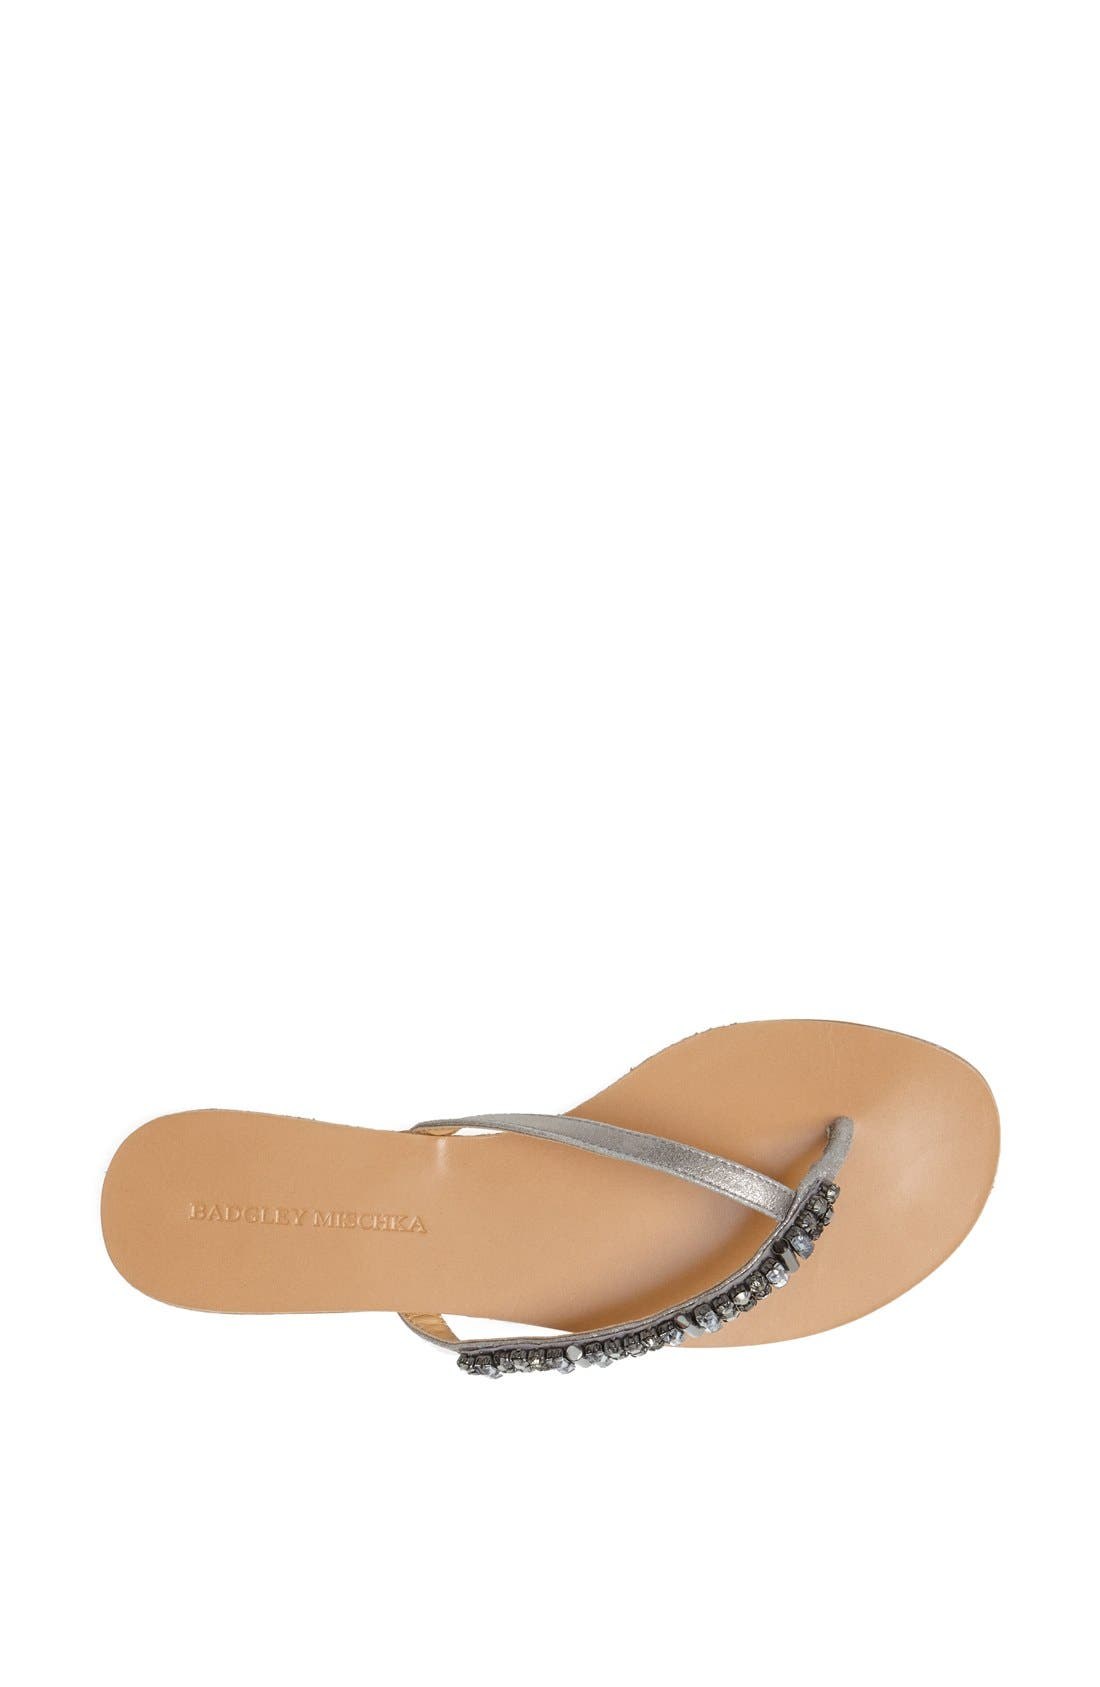 Alternate Image 3  - Badgley Mischka 'Kamryn' Thong Sandal